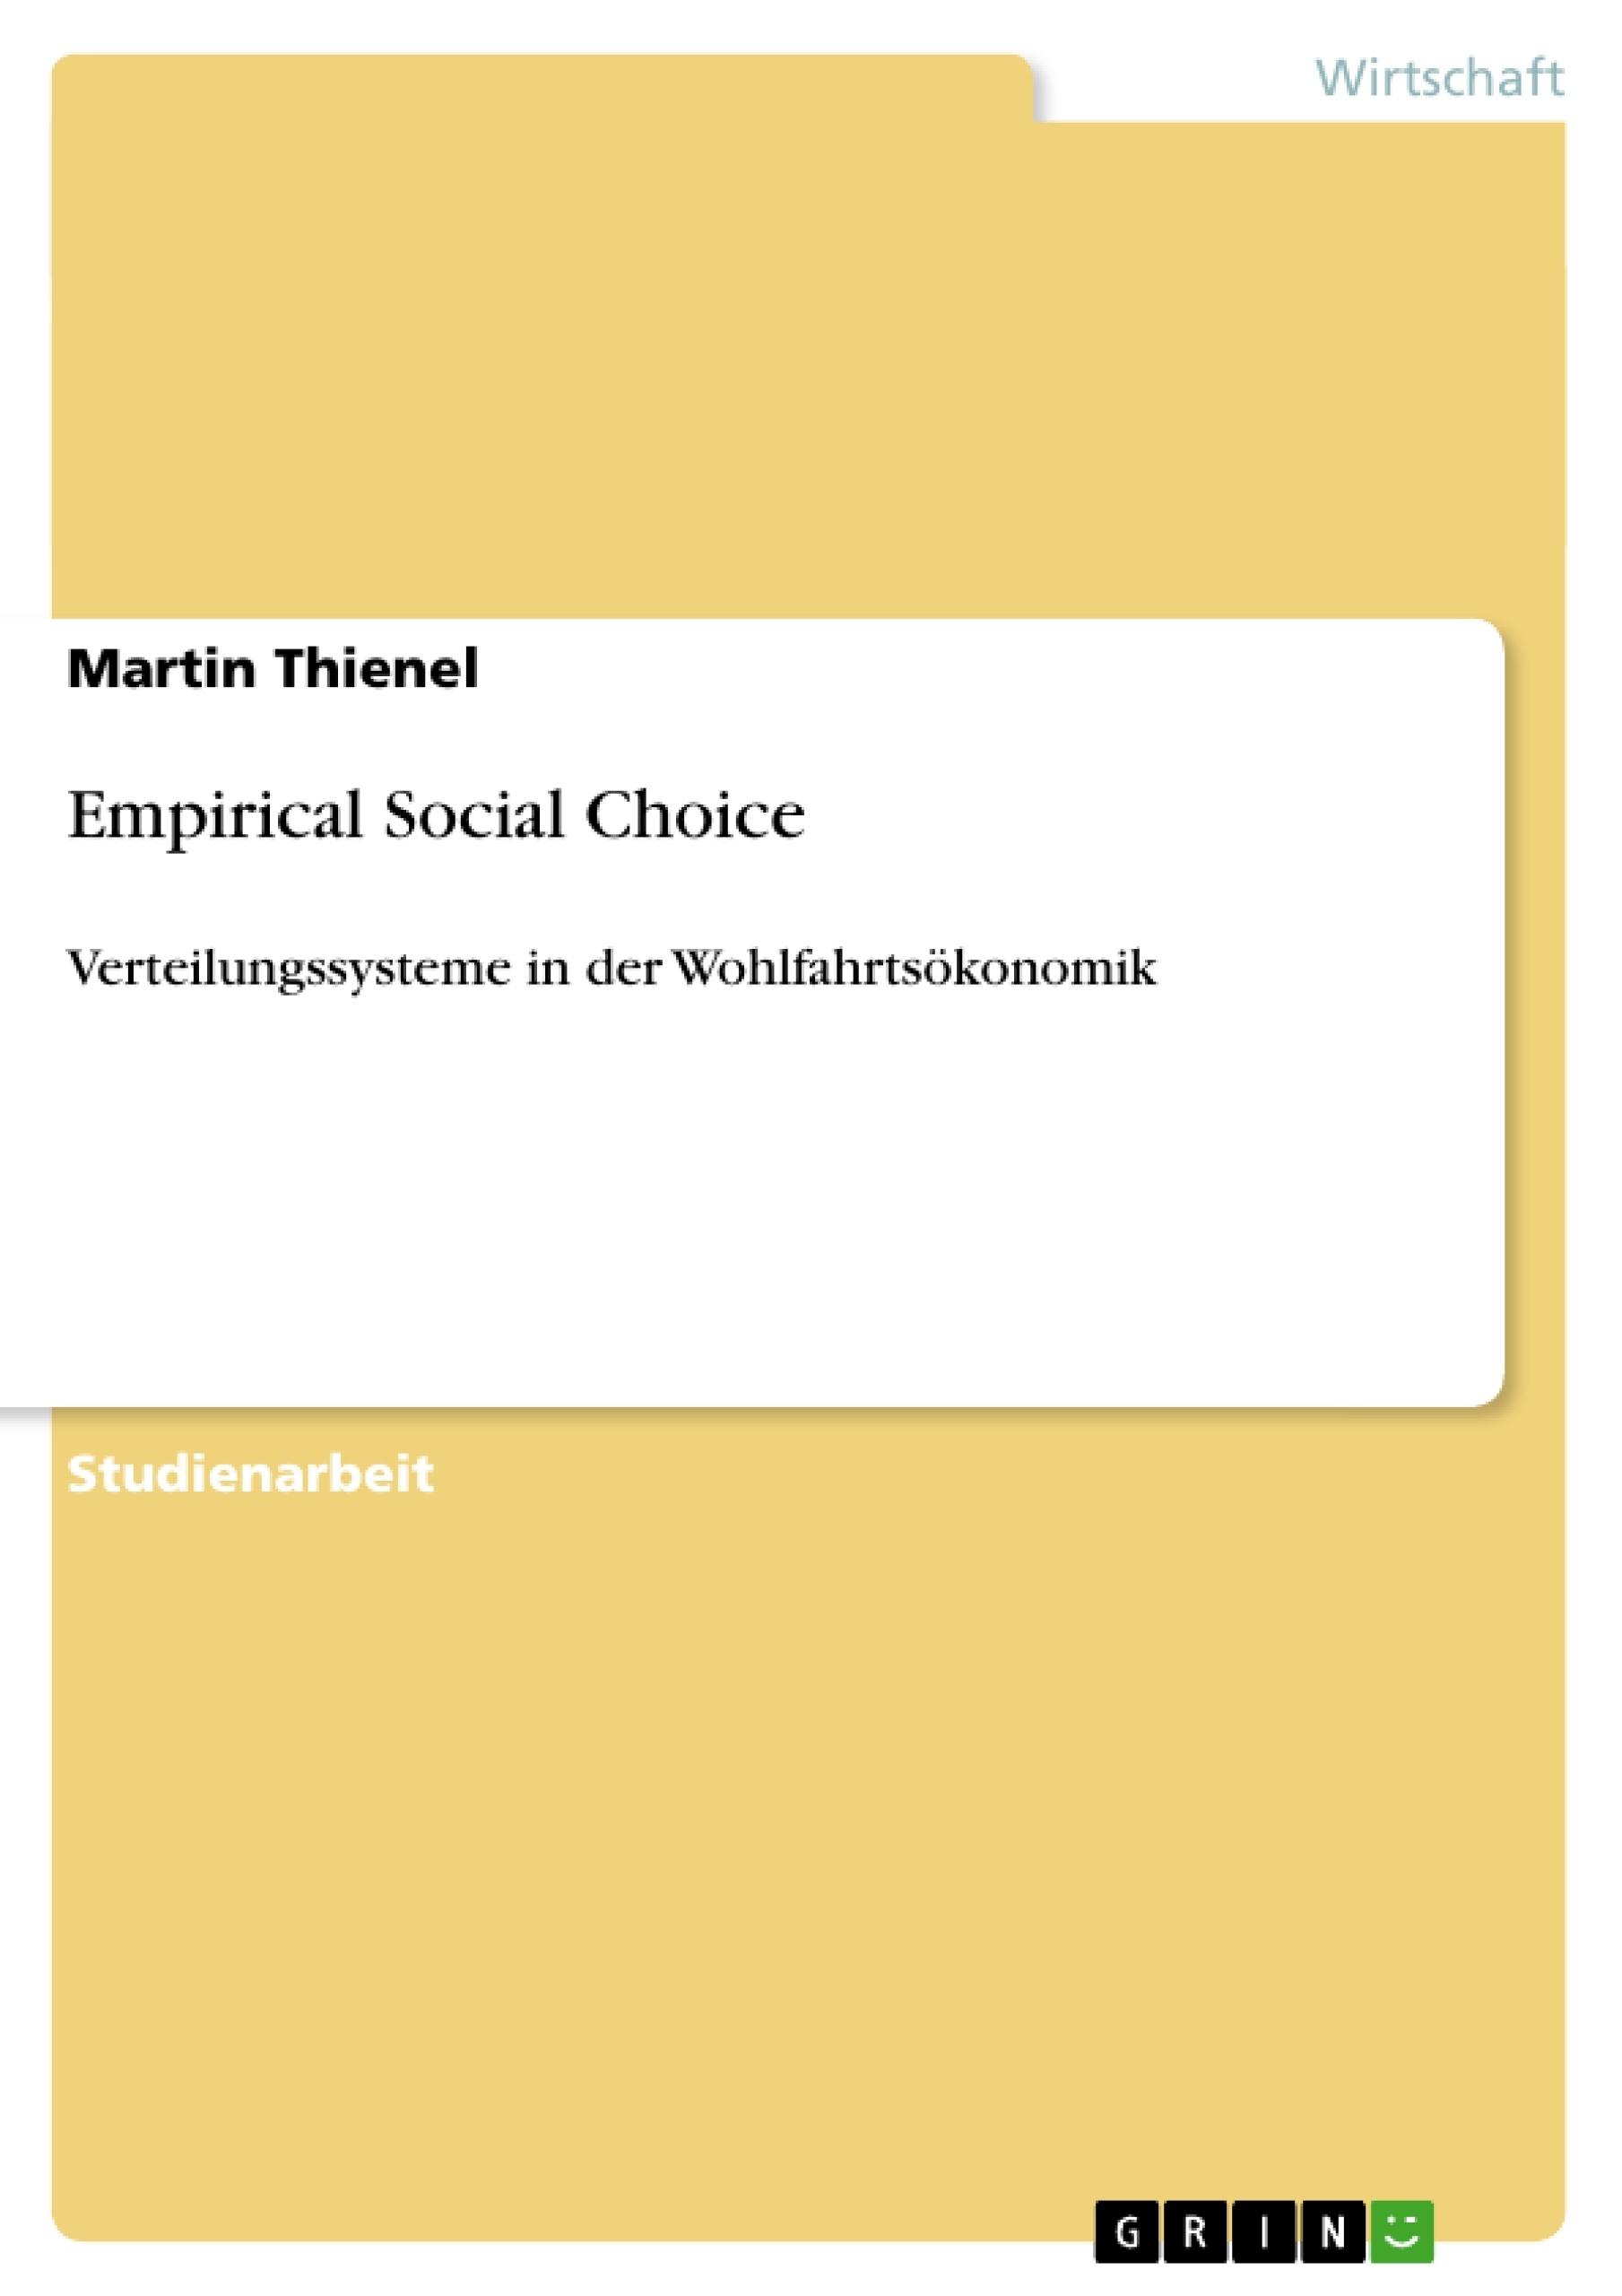 Titel: Empirical Social Choice